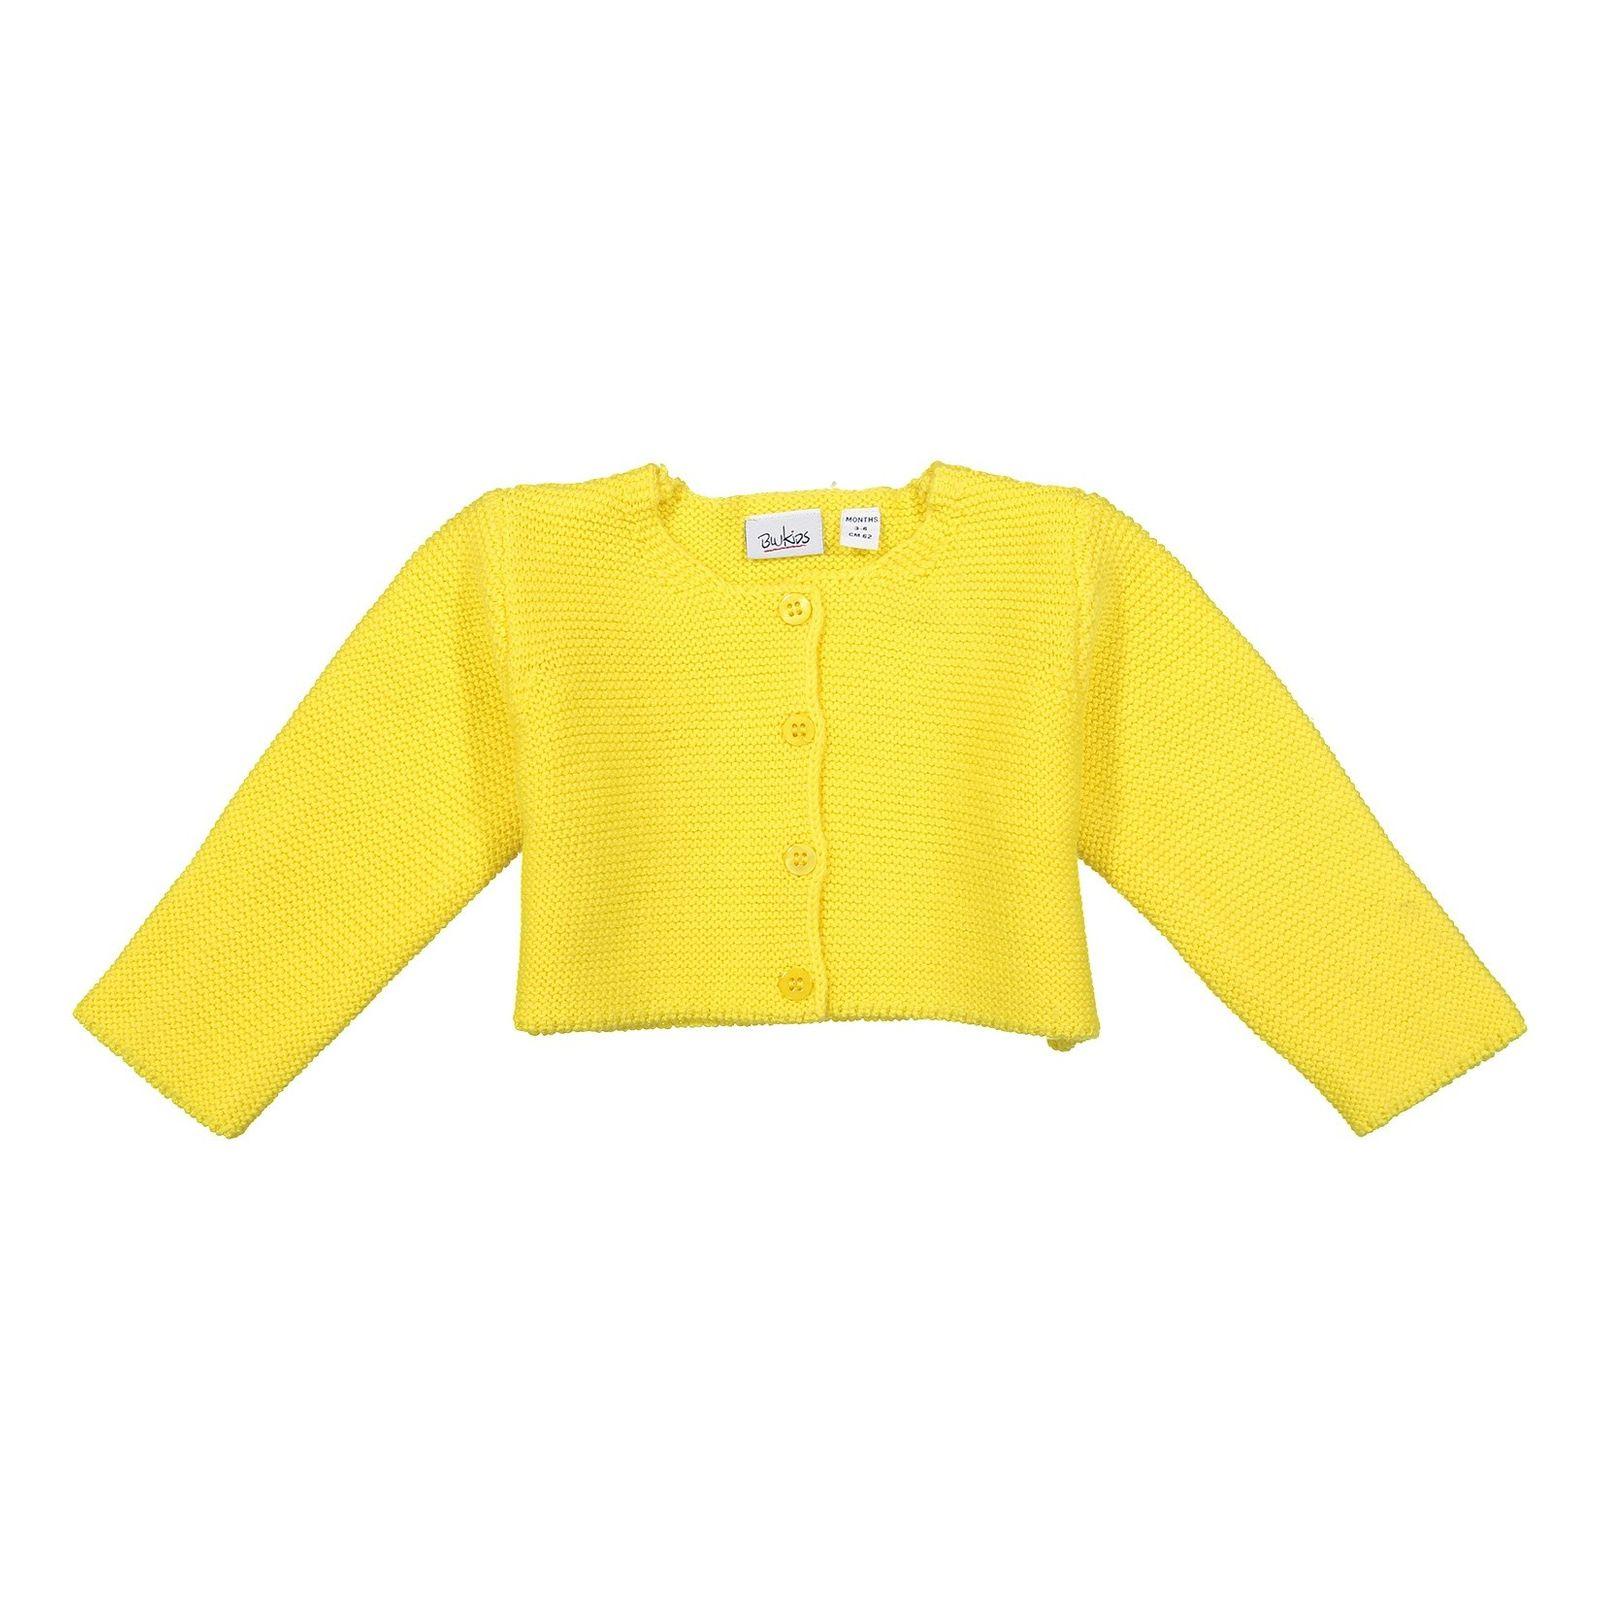 ژاکت نخی نوزادی دخترانه - بلوکیدز - زرد - 1